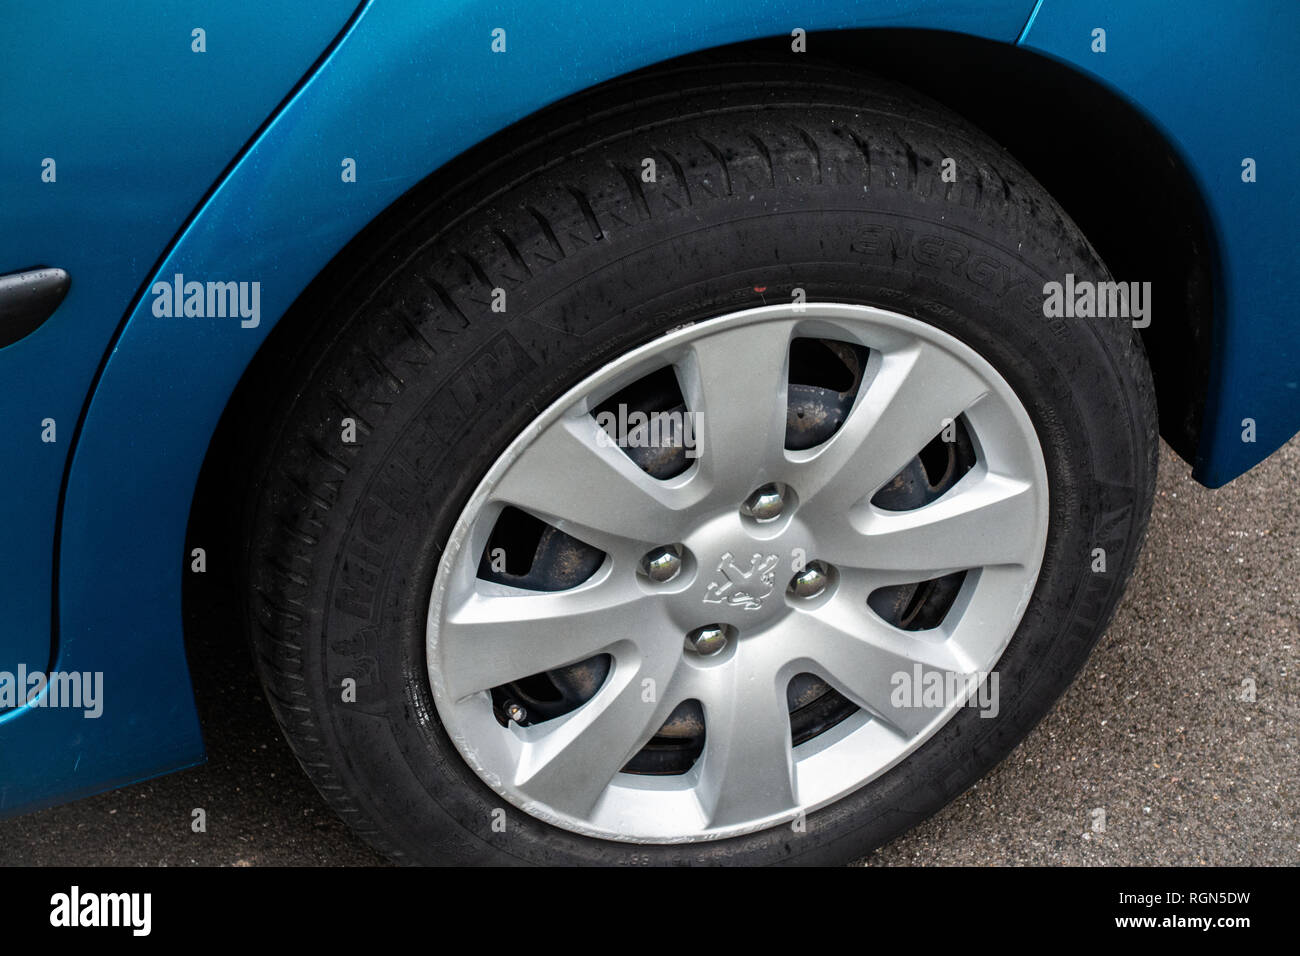 Peugeot 207 car wheel, tyre and wheel trim - Stock Image